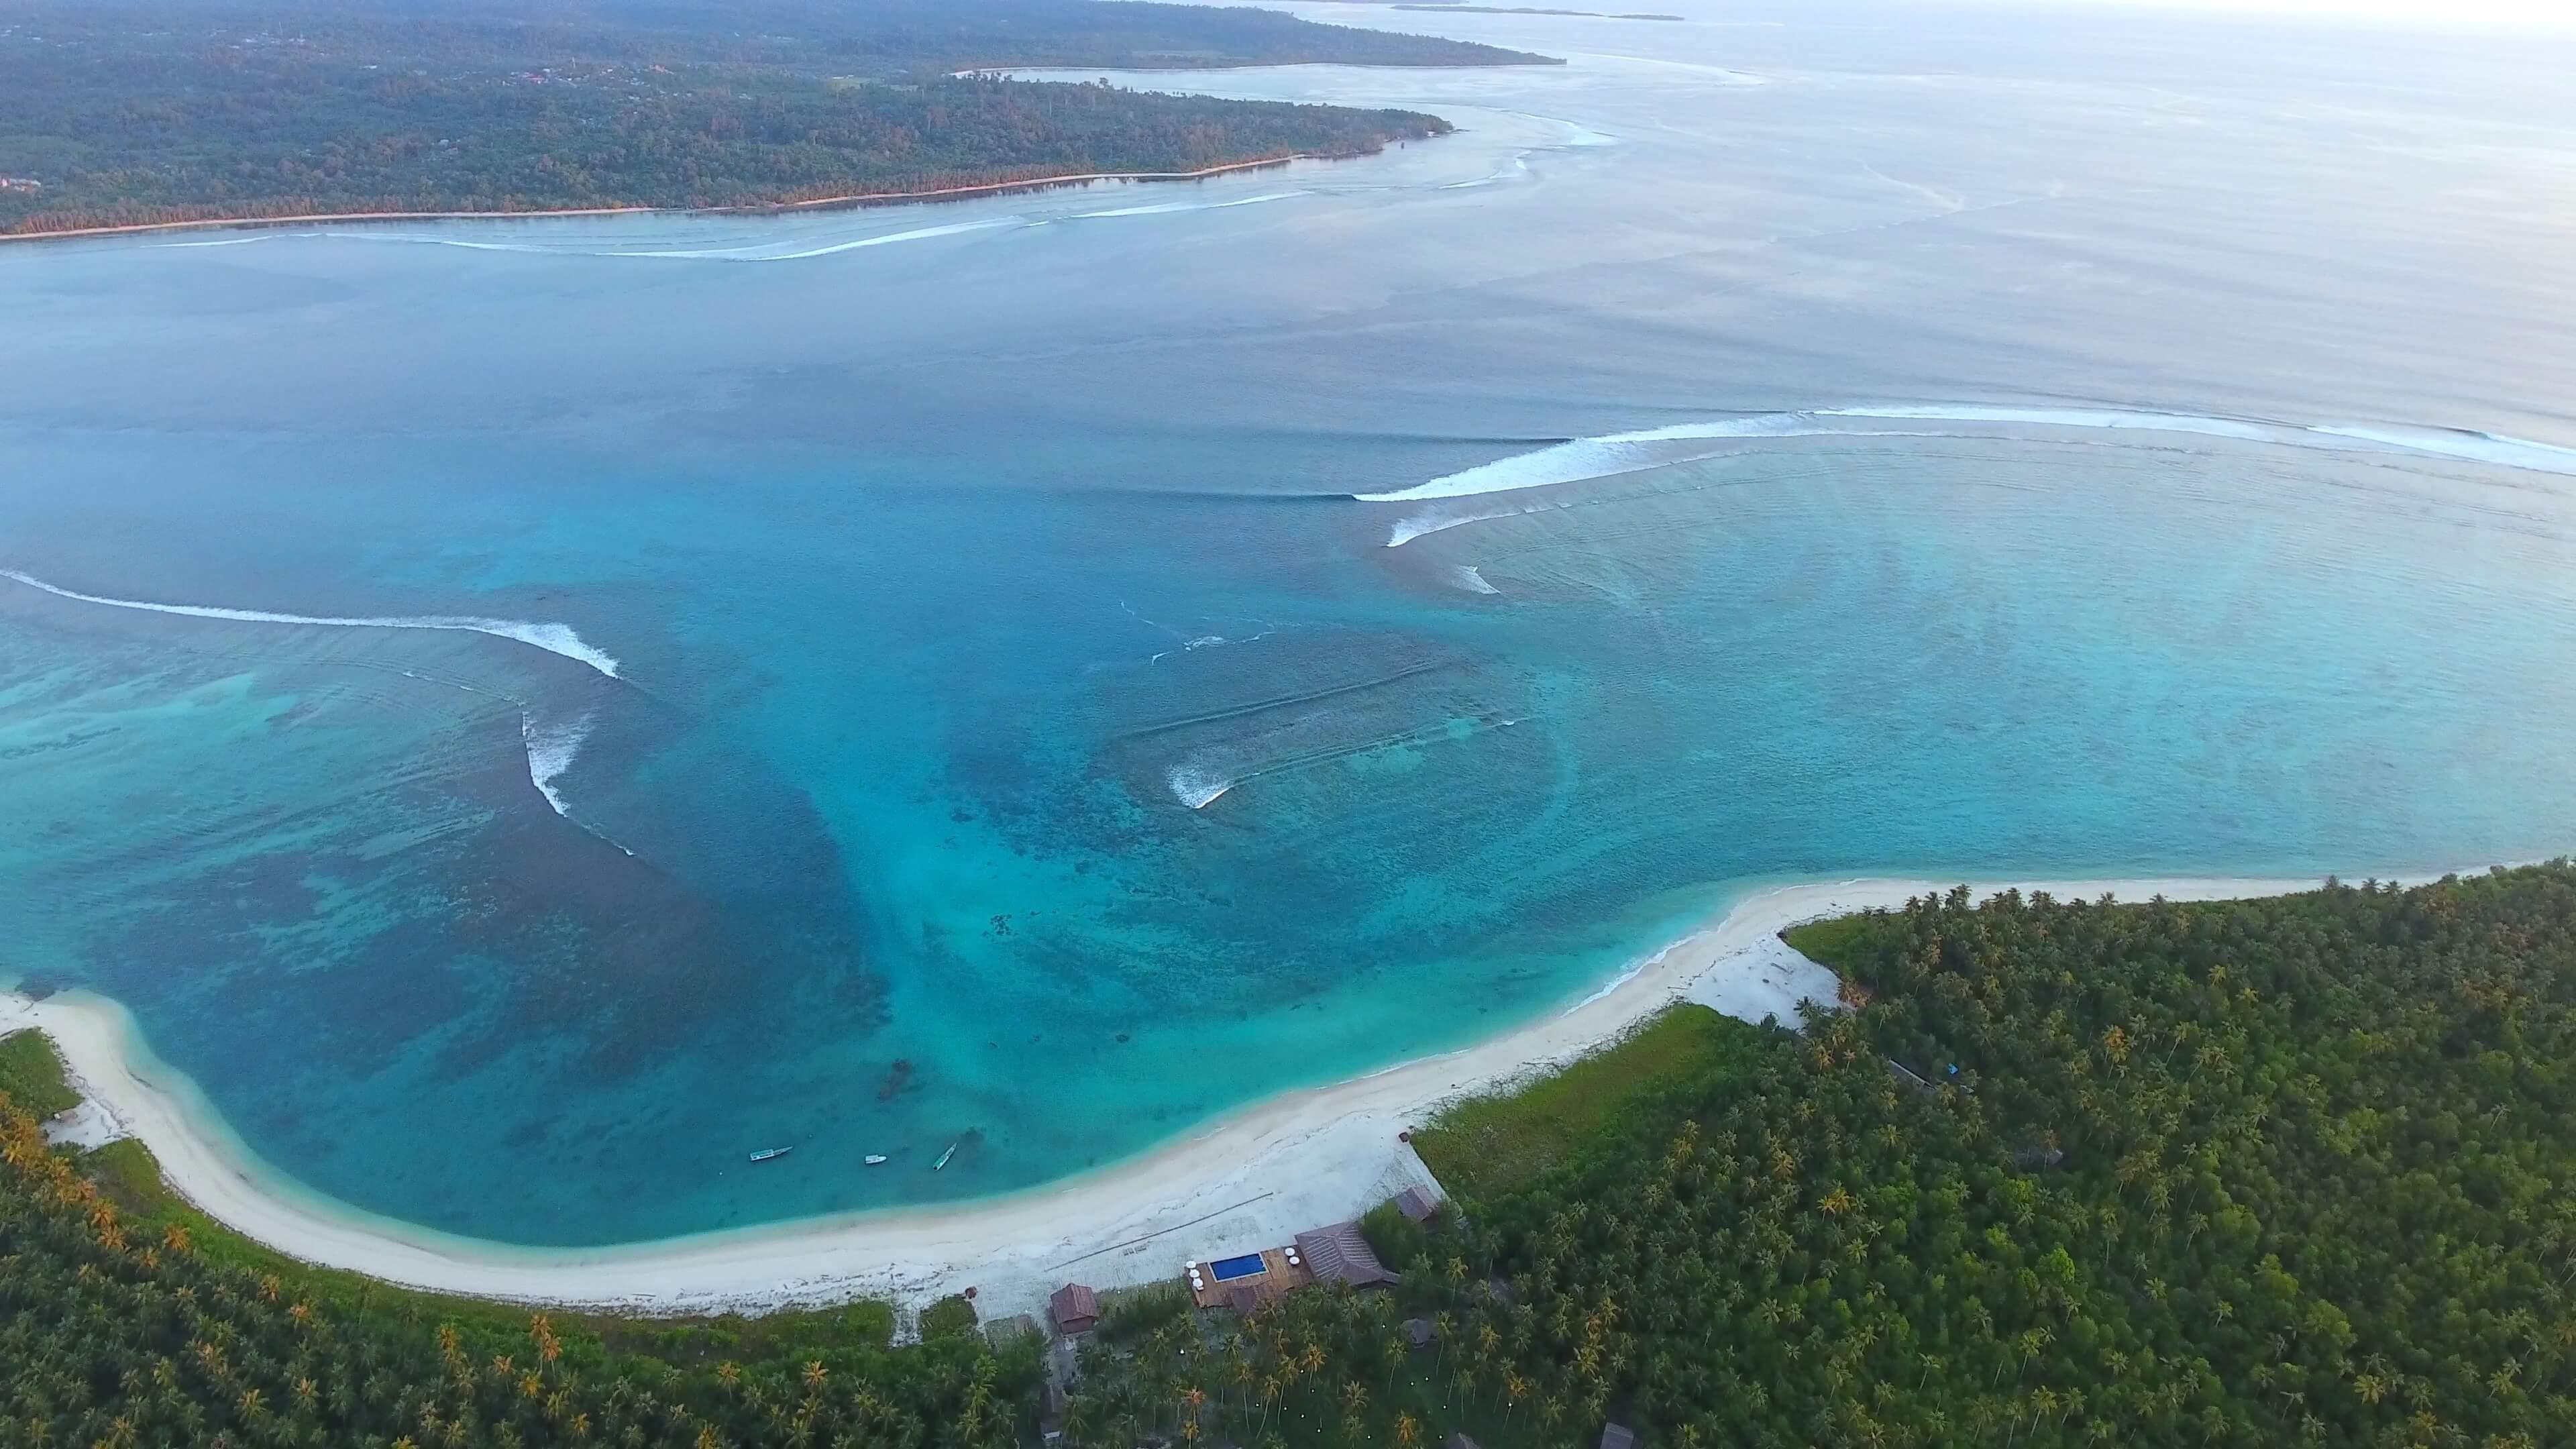 Surfcamp Awera Resort in Central Mentawai, Sumatra Occidental, Indonesia